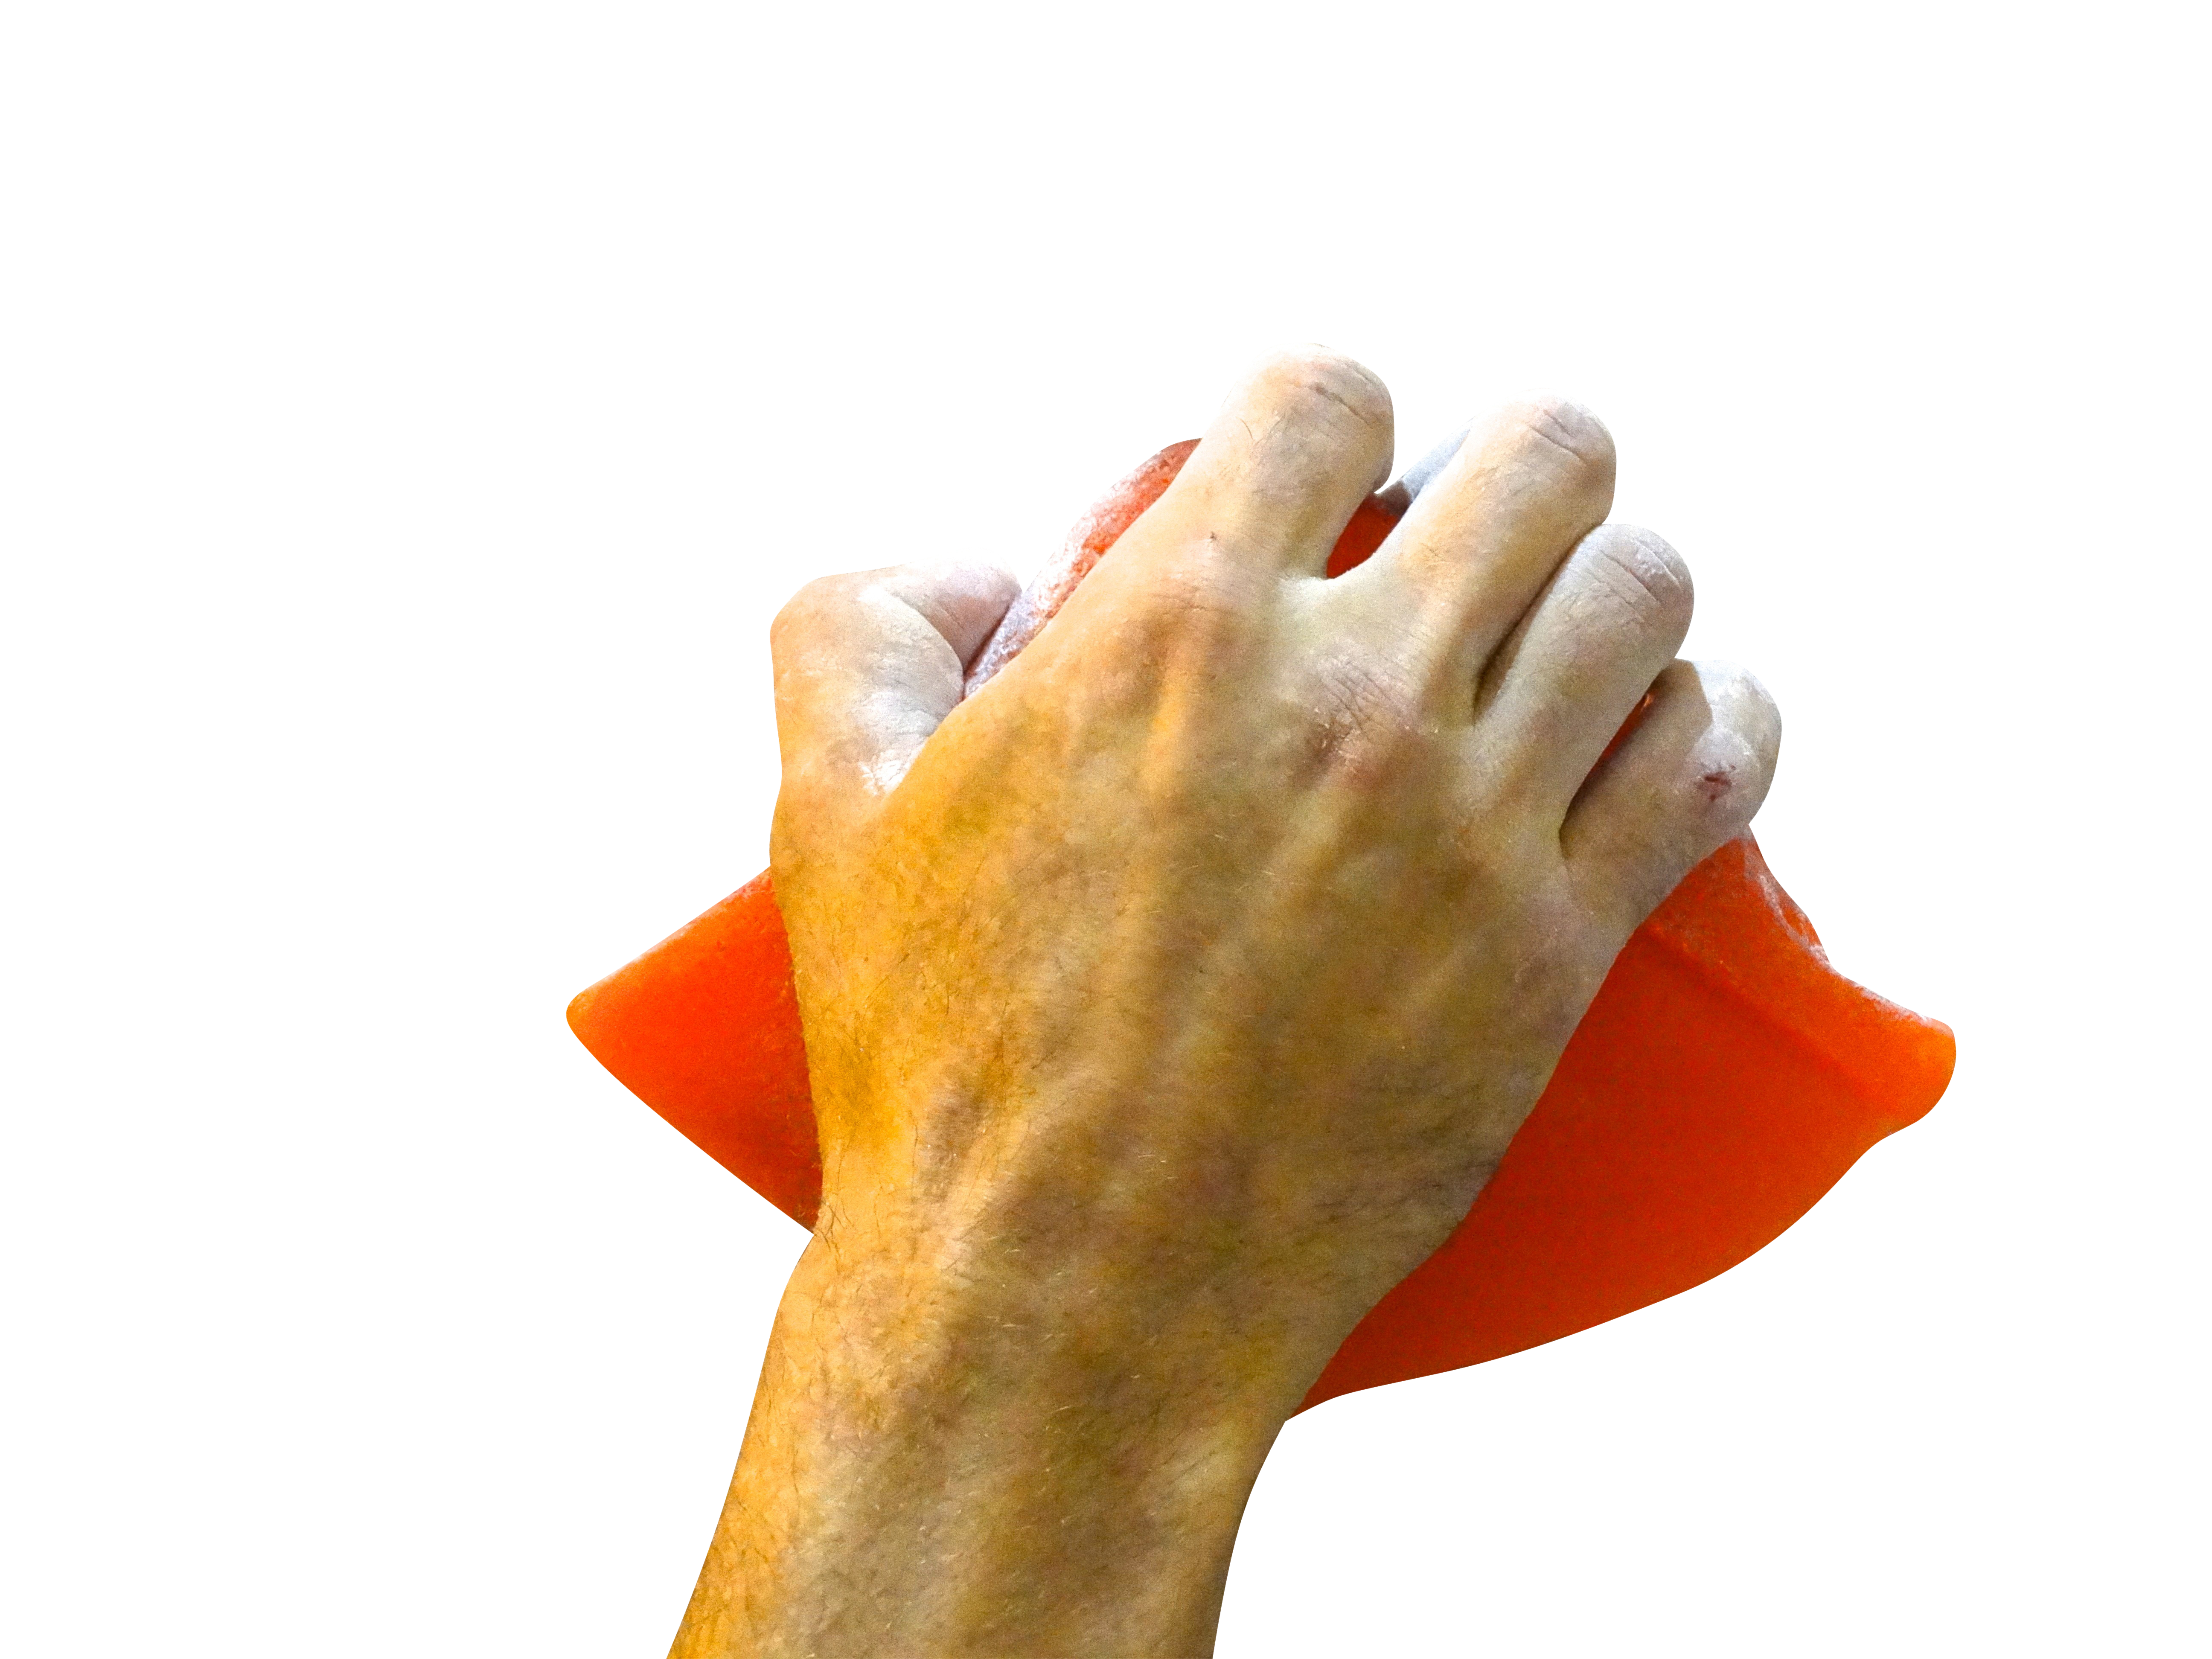 Climbing Hand